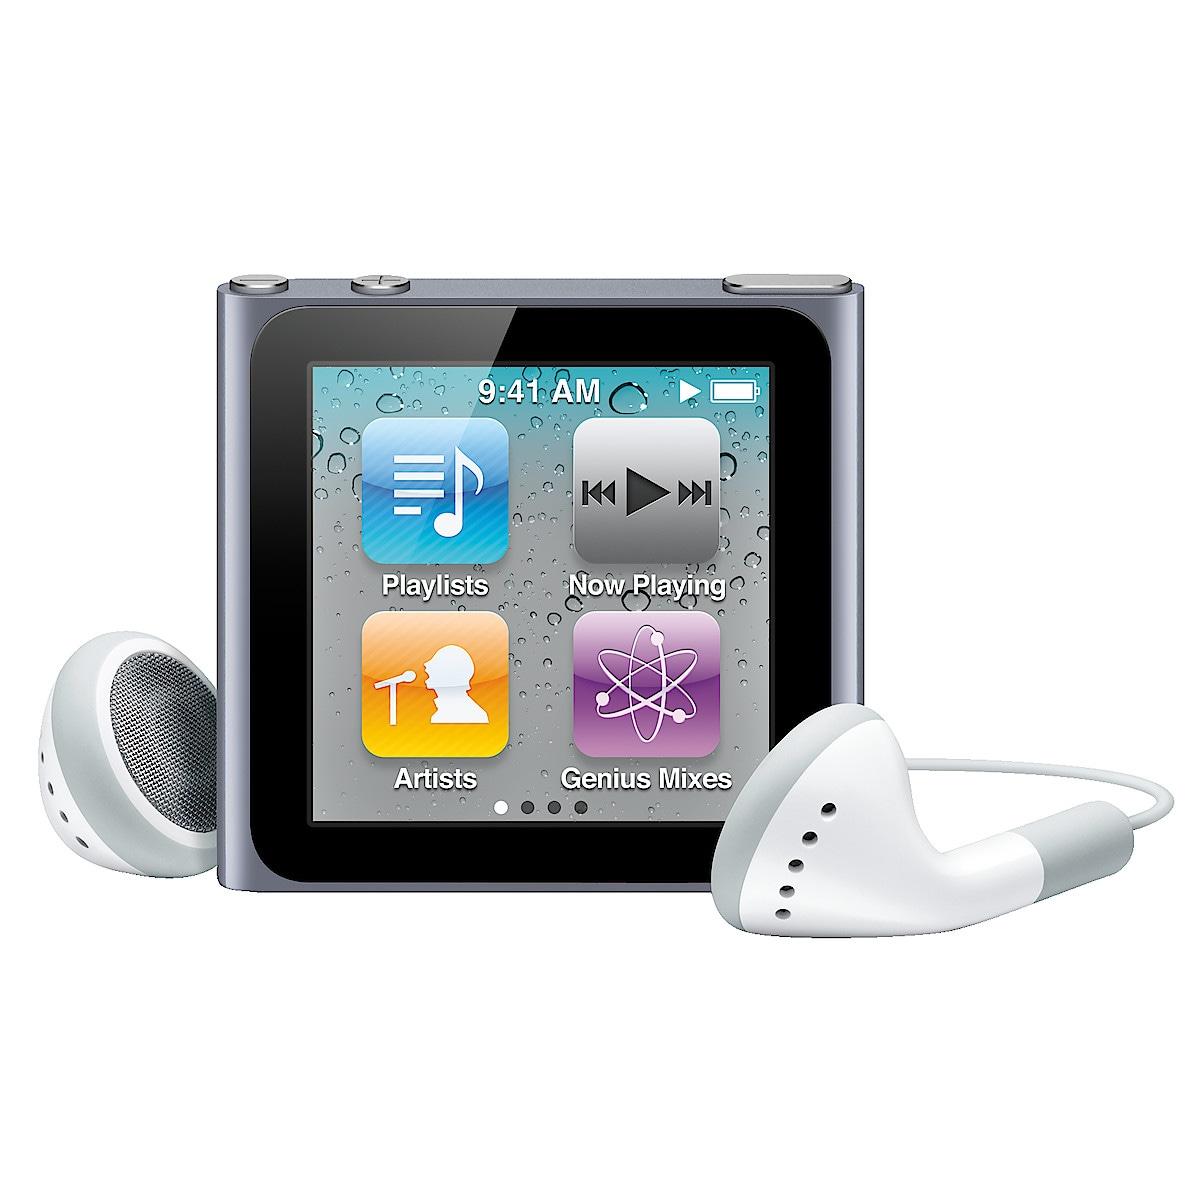 Apple iPod nano G6 MP3 Player